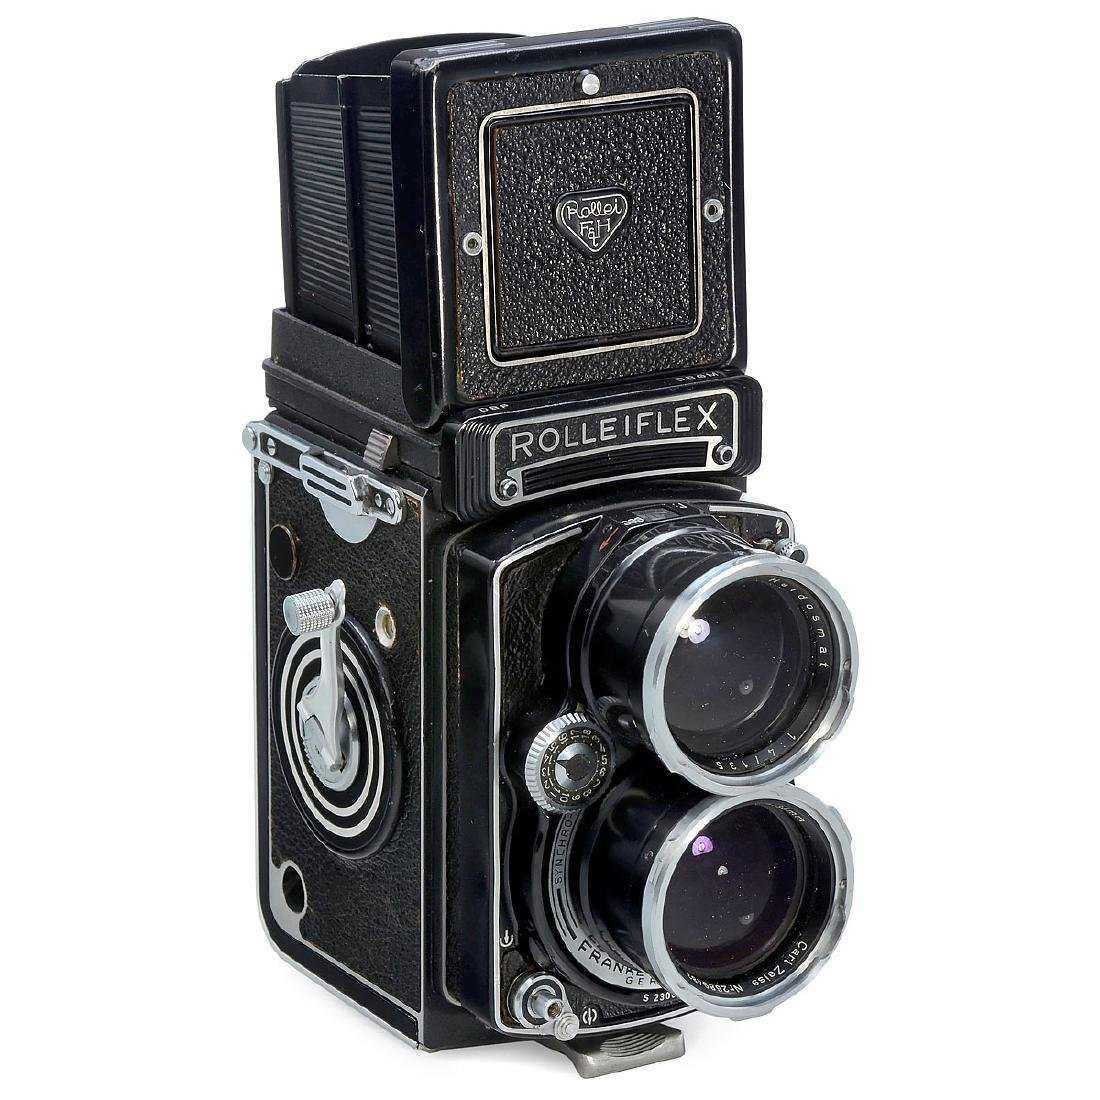 Tele-Rolleiflex, 1960